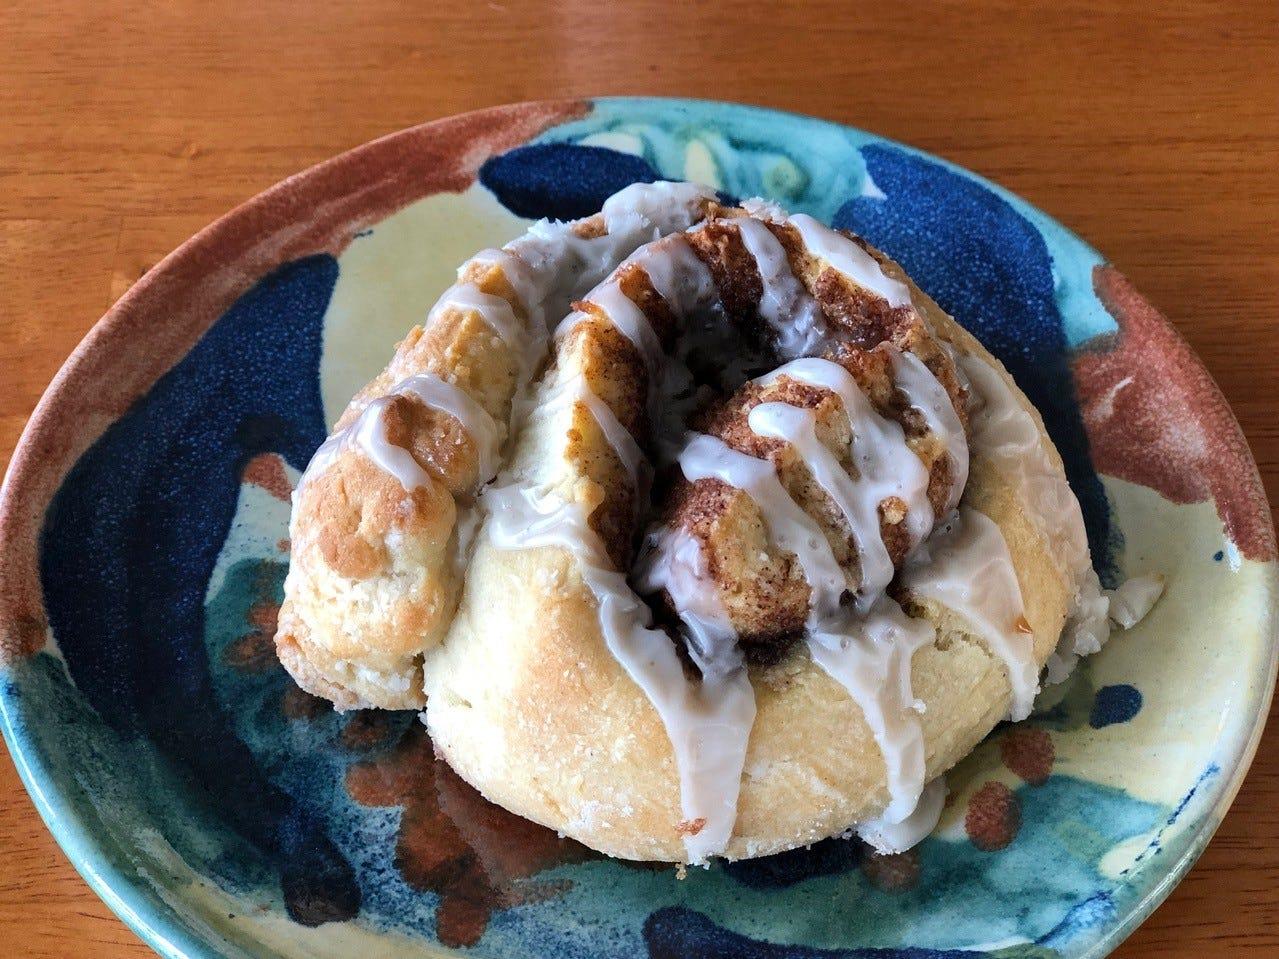 Example of Eden Bakery's gluten-free cinnamon rolls.